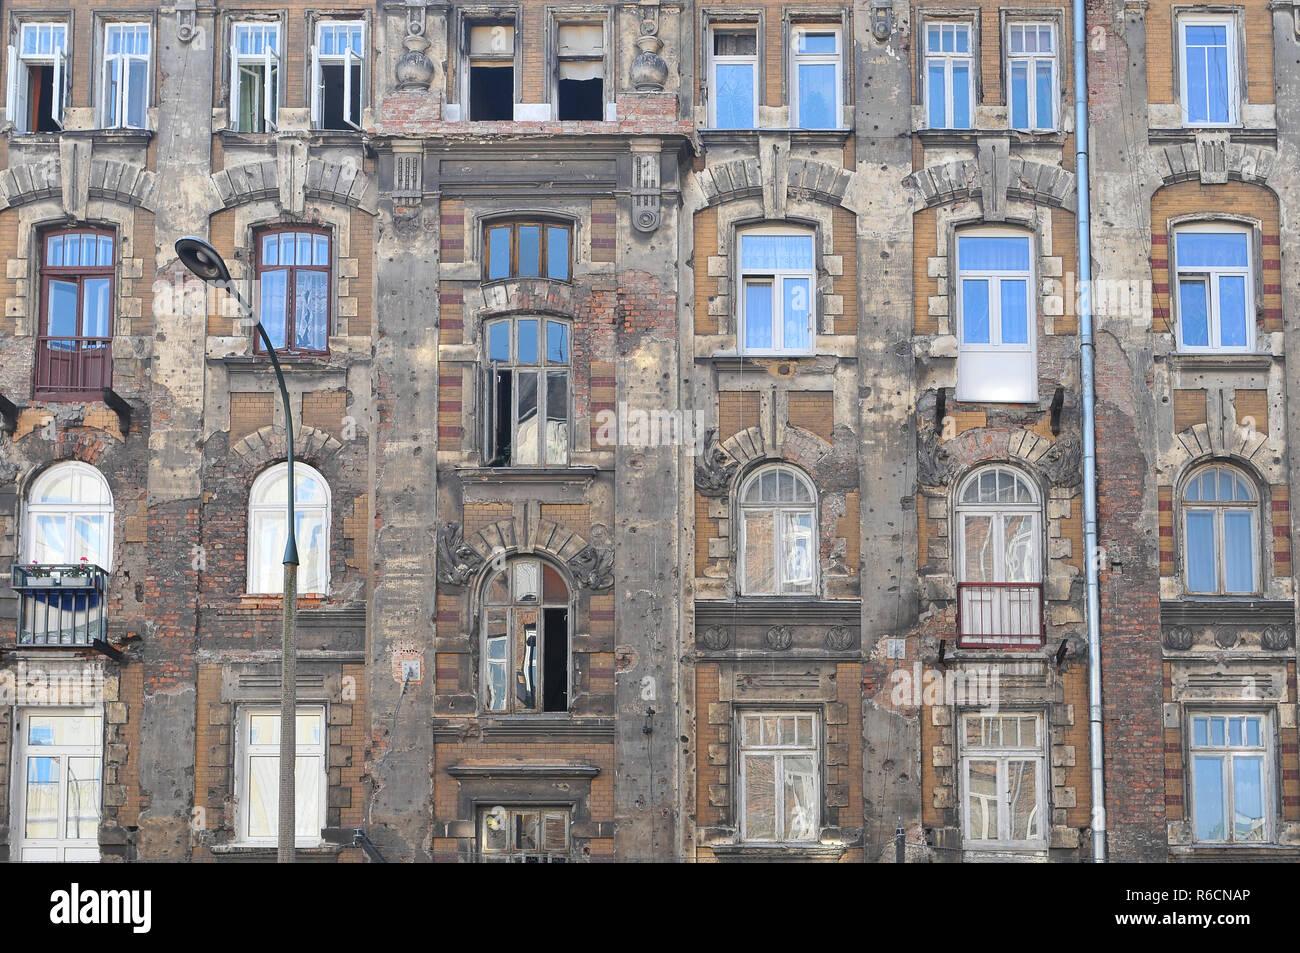 Old Building In The Praga District, Warsaw, Poland - Stock Image